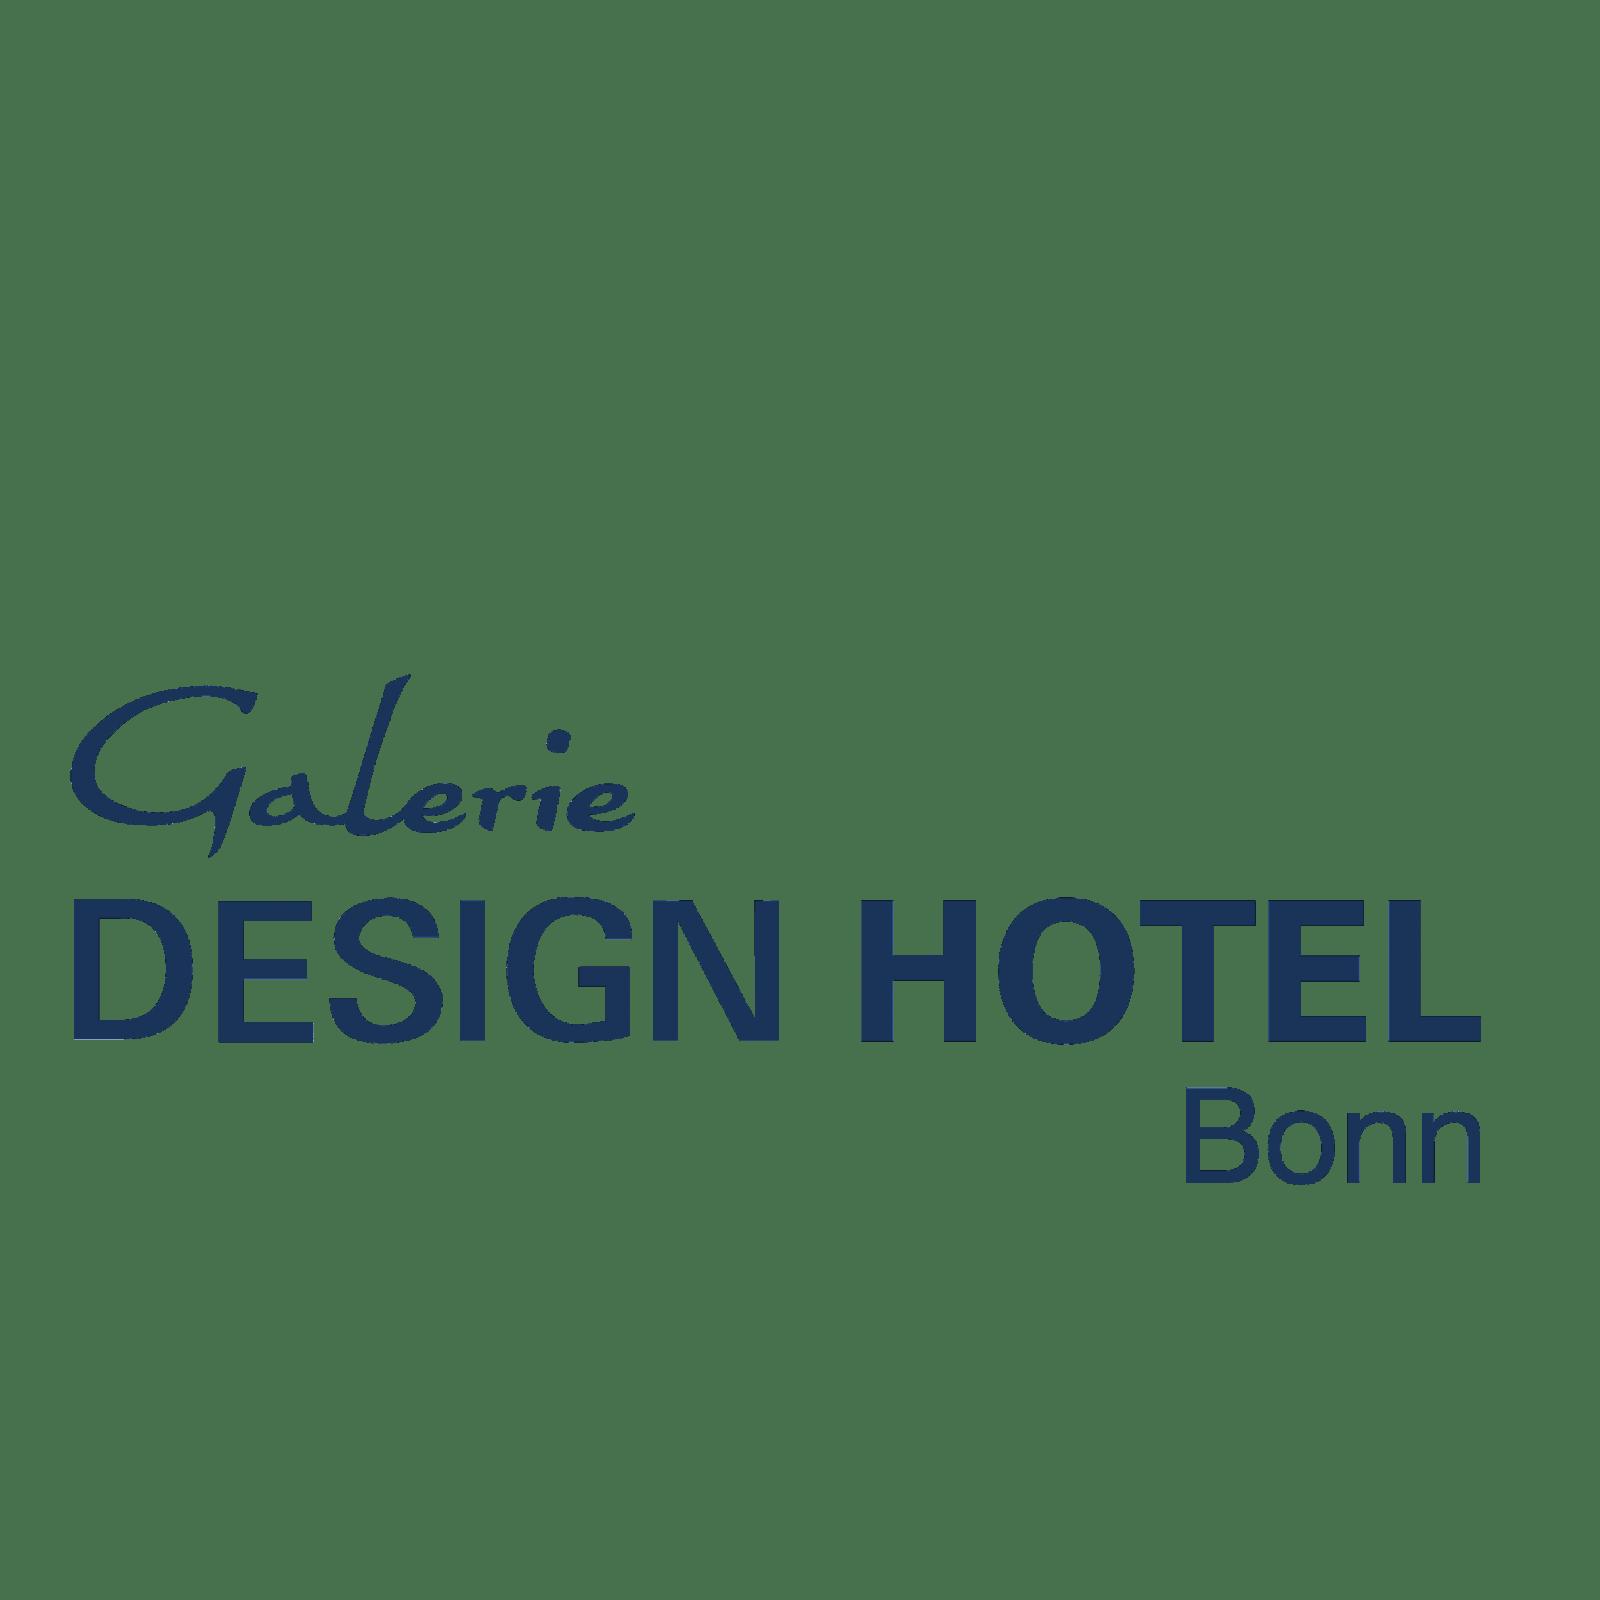 Design Hotel Bonn